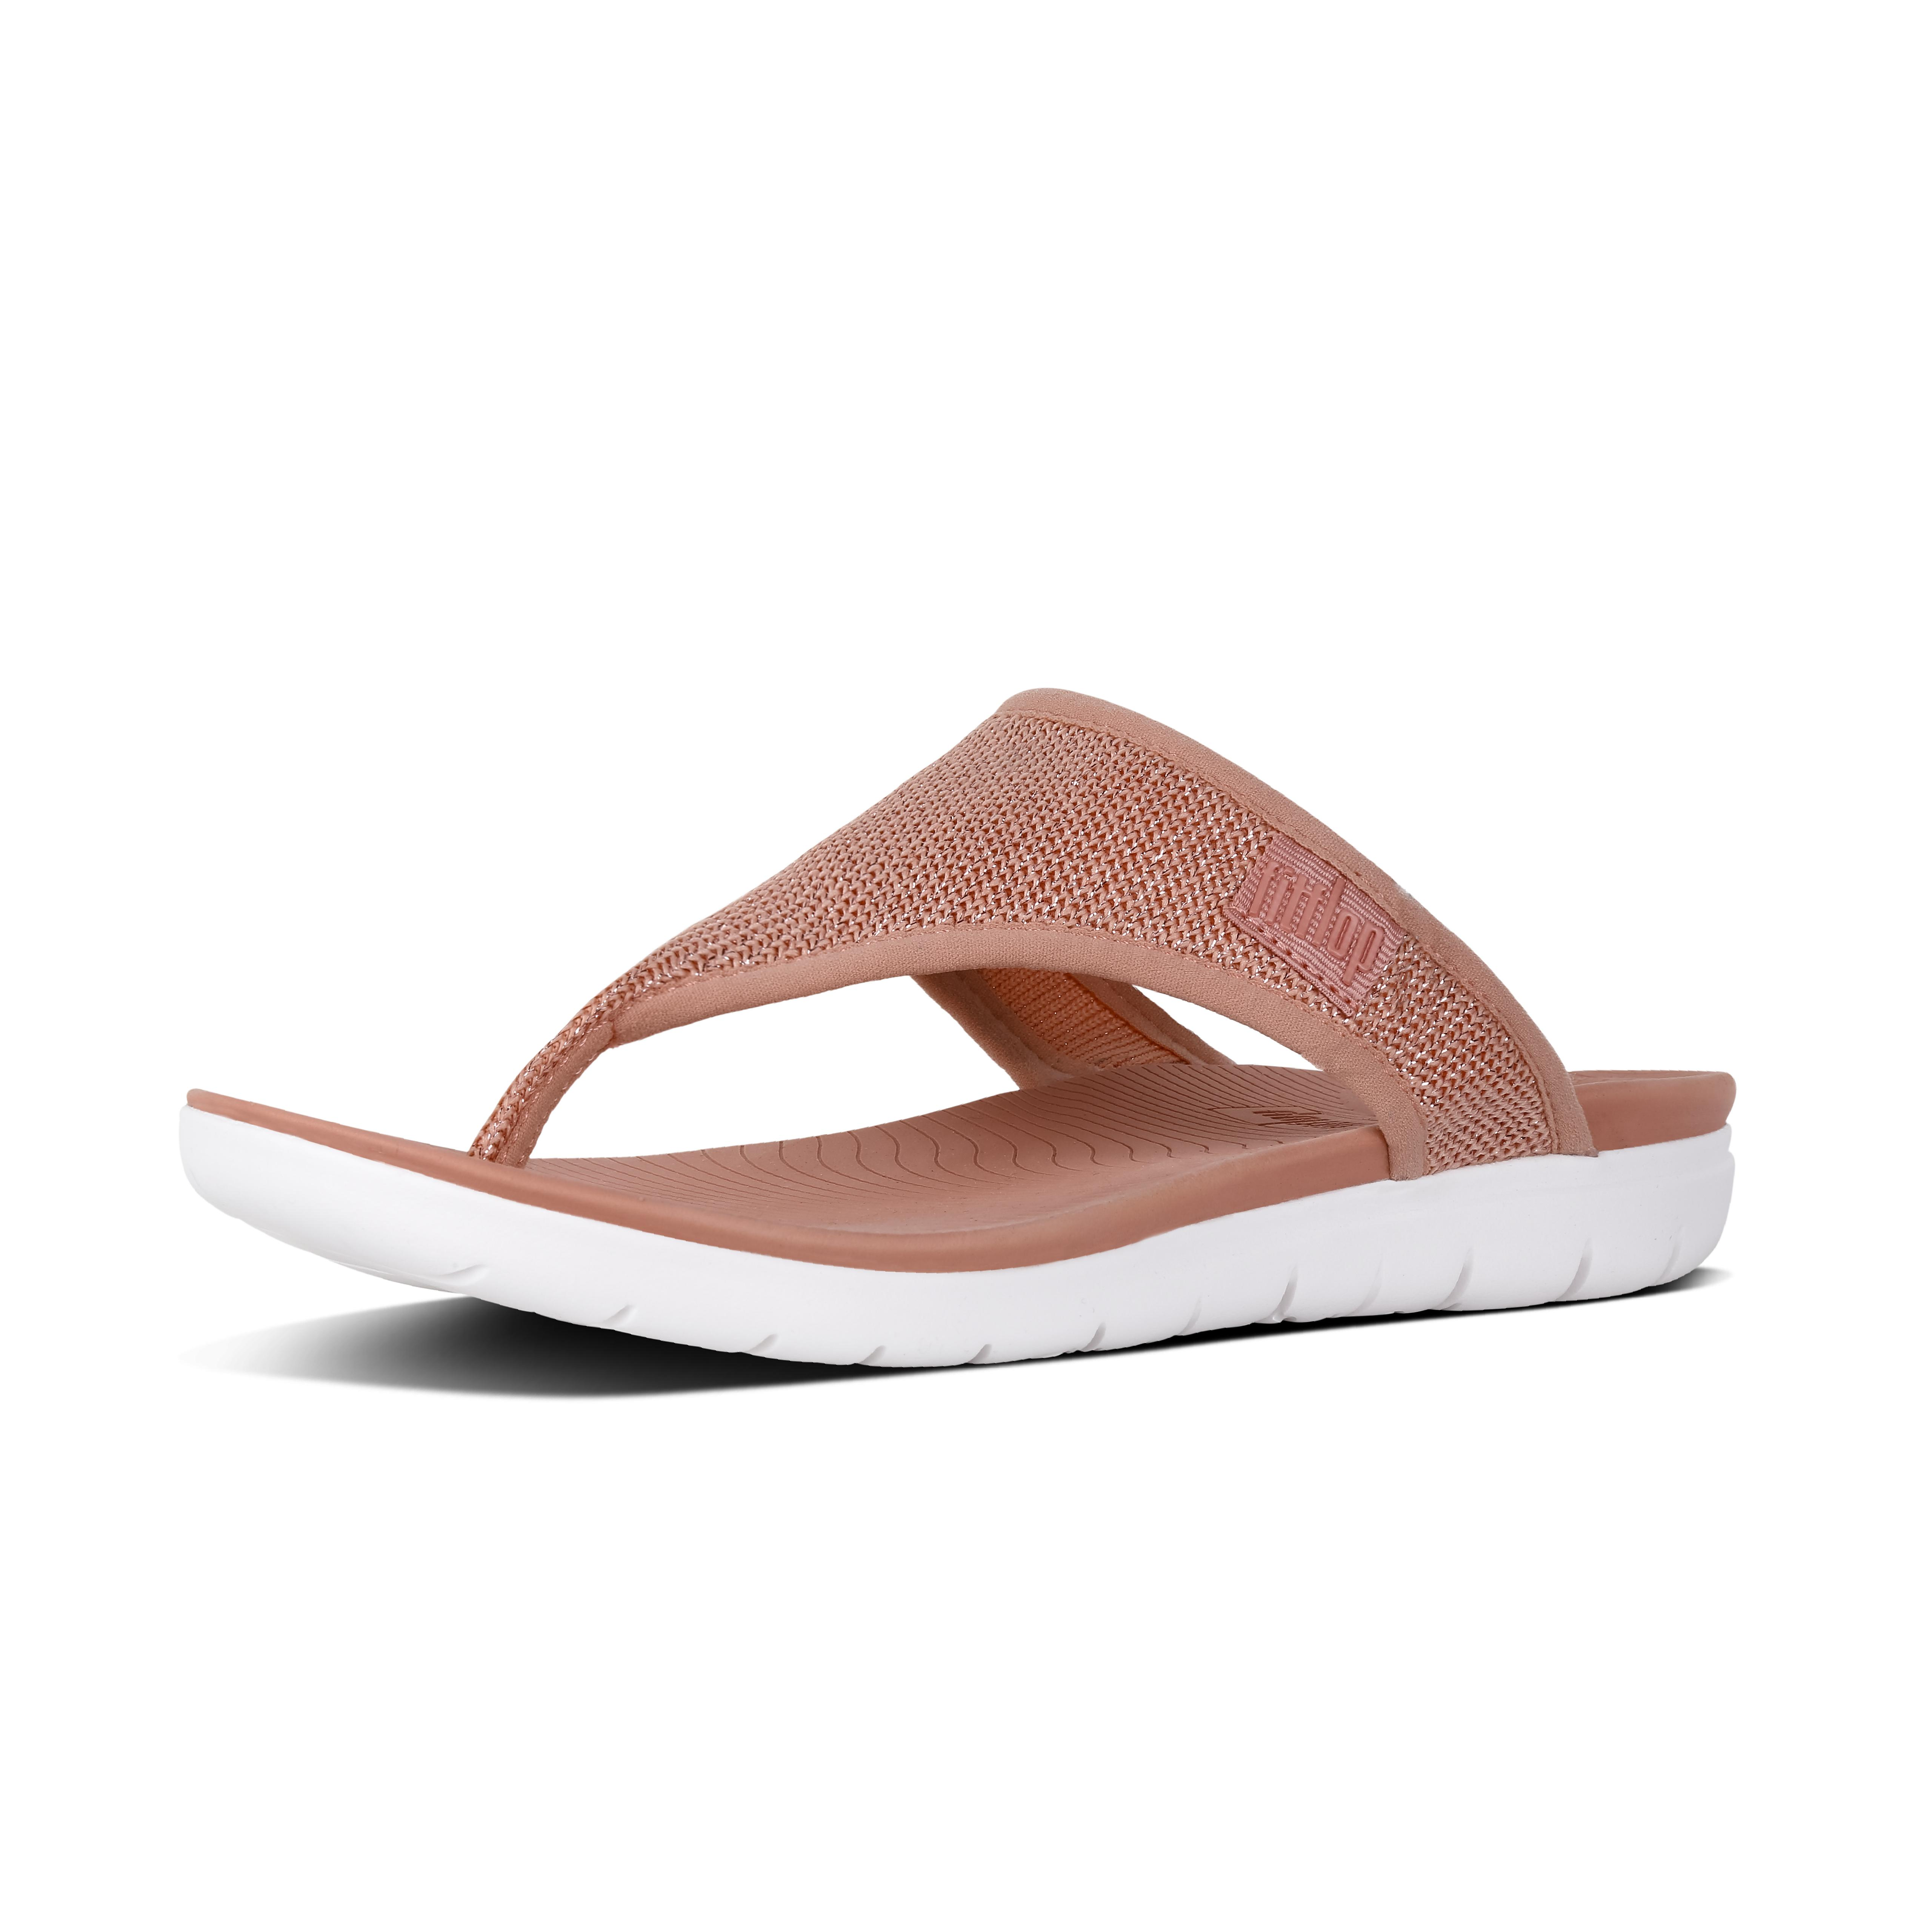 Uberknit toe thong sandals dusky pink metallic m46 612